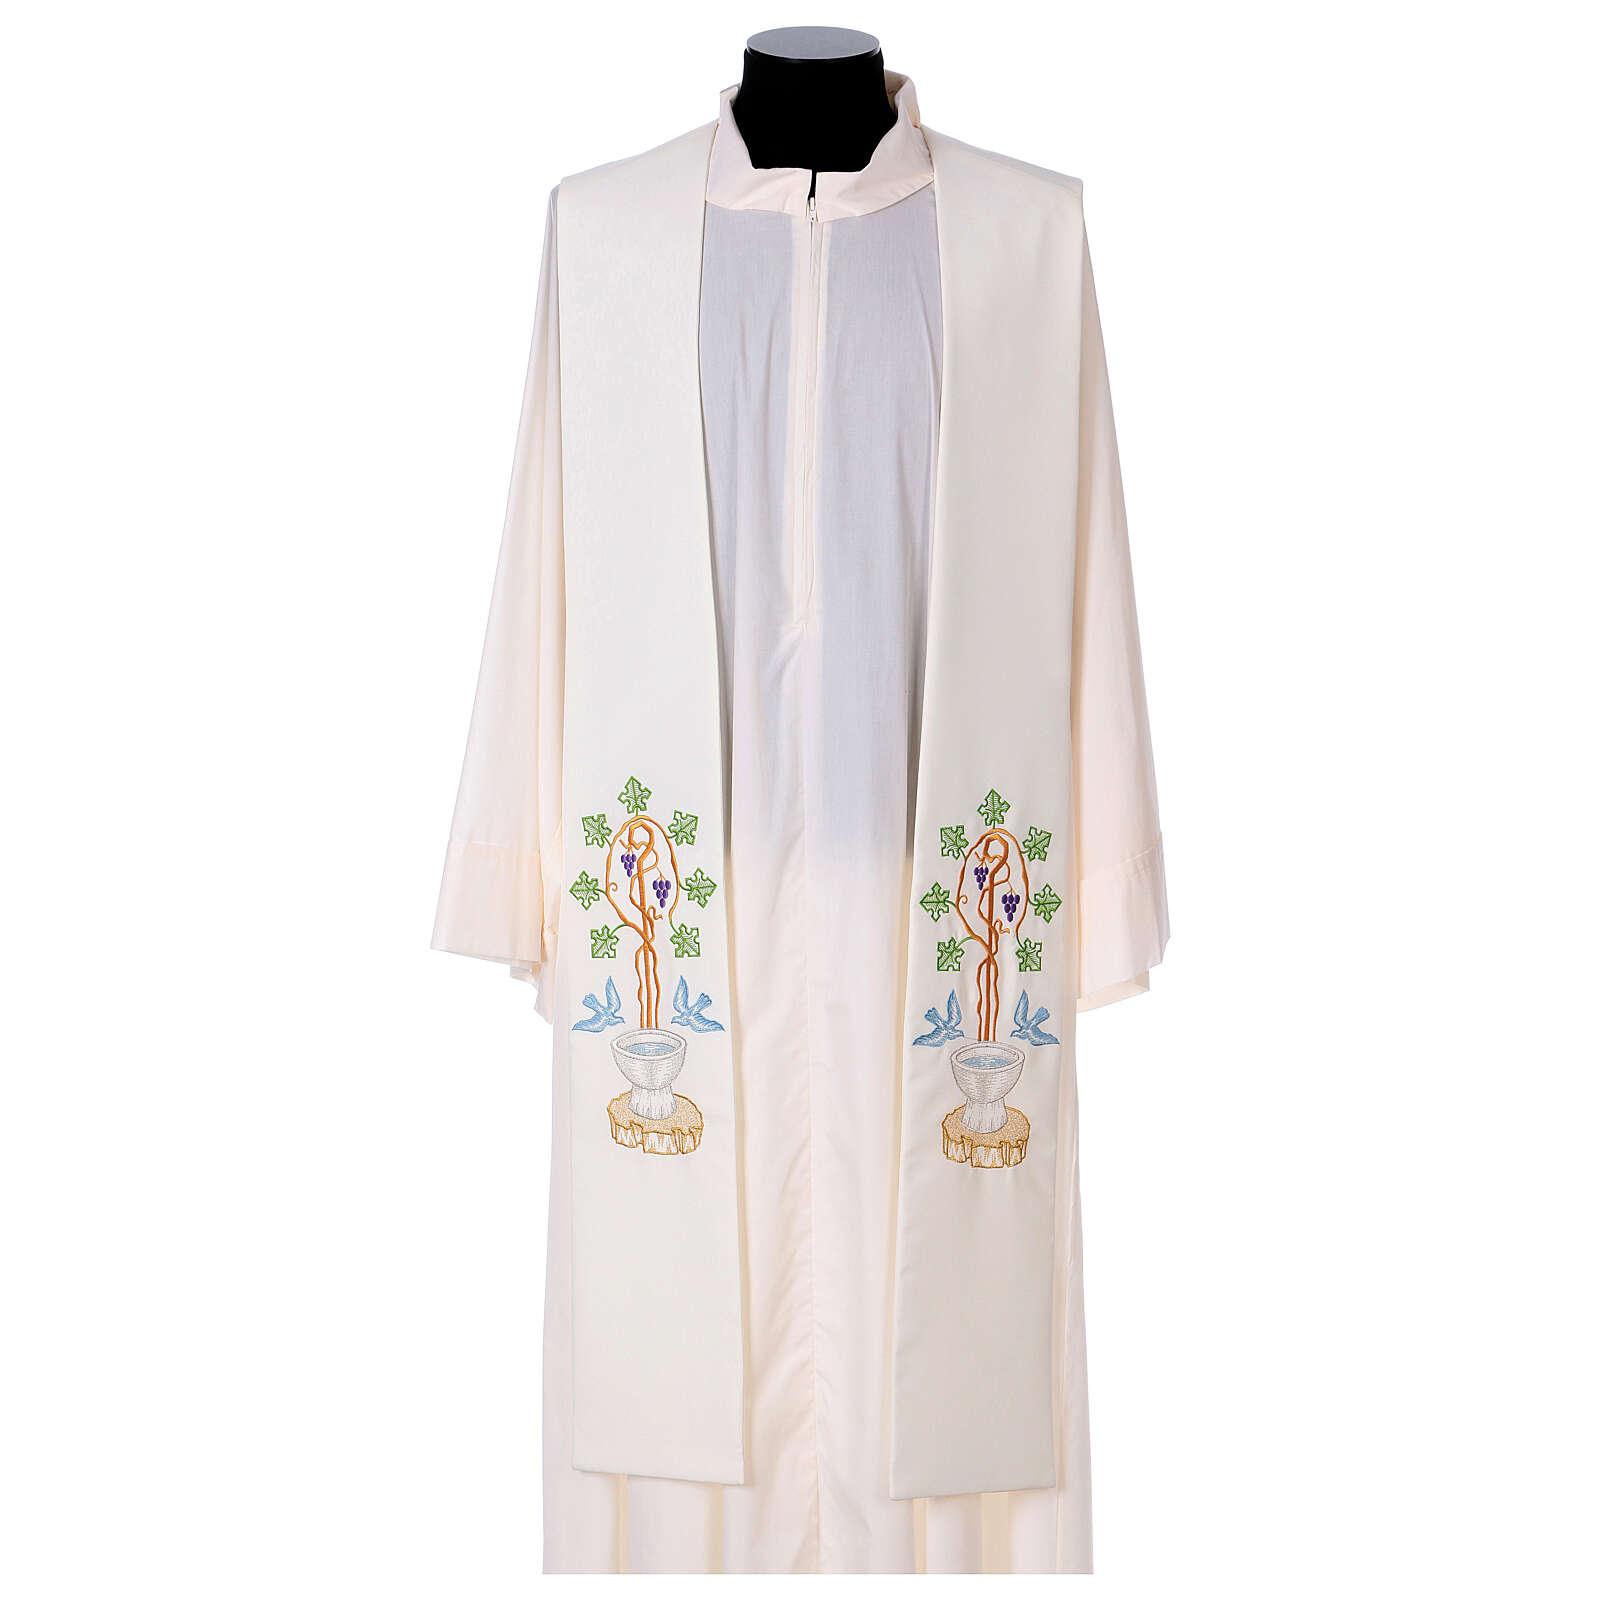 Stolone 100% poliestere fonte battesimale 4